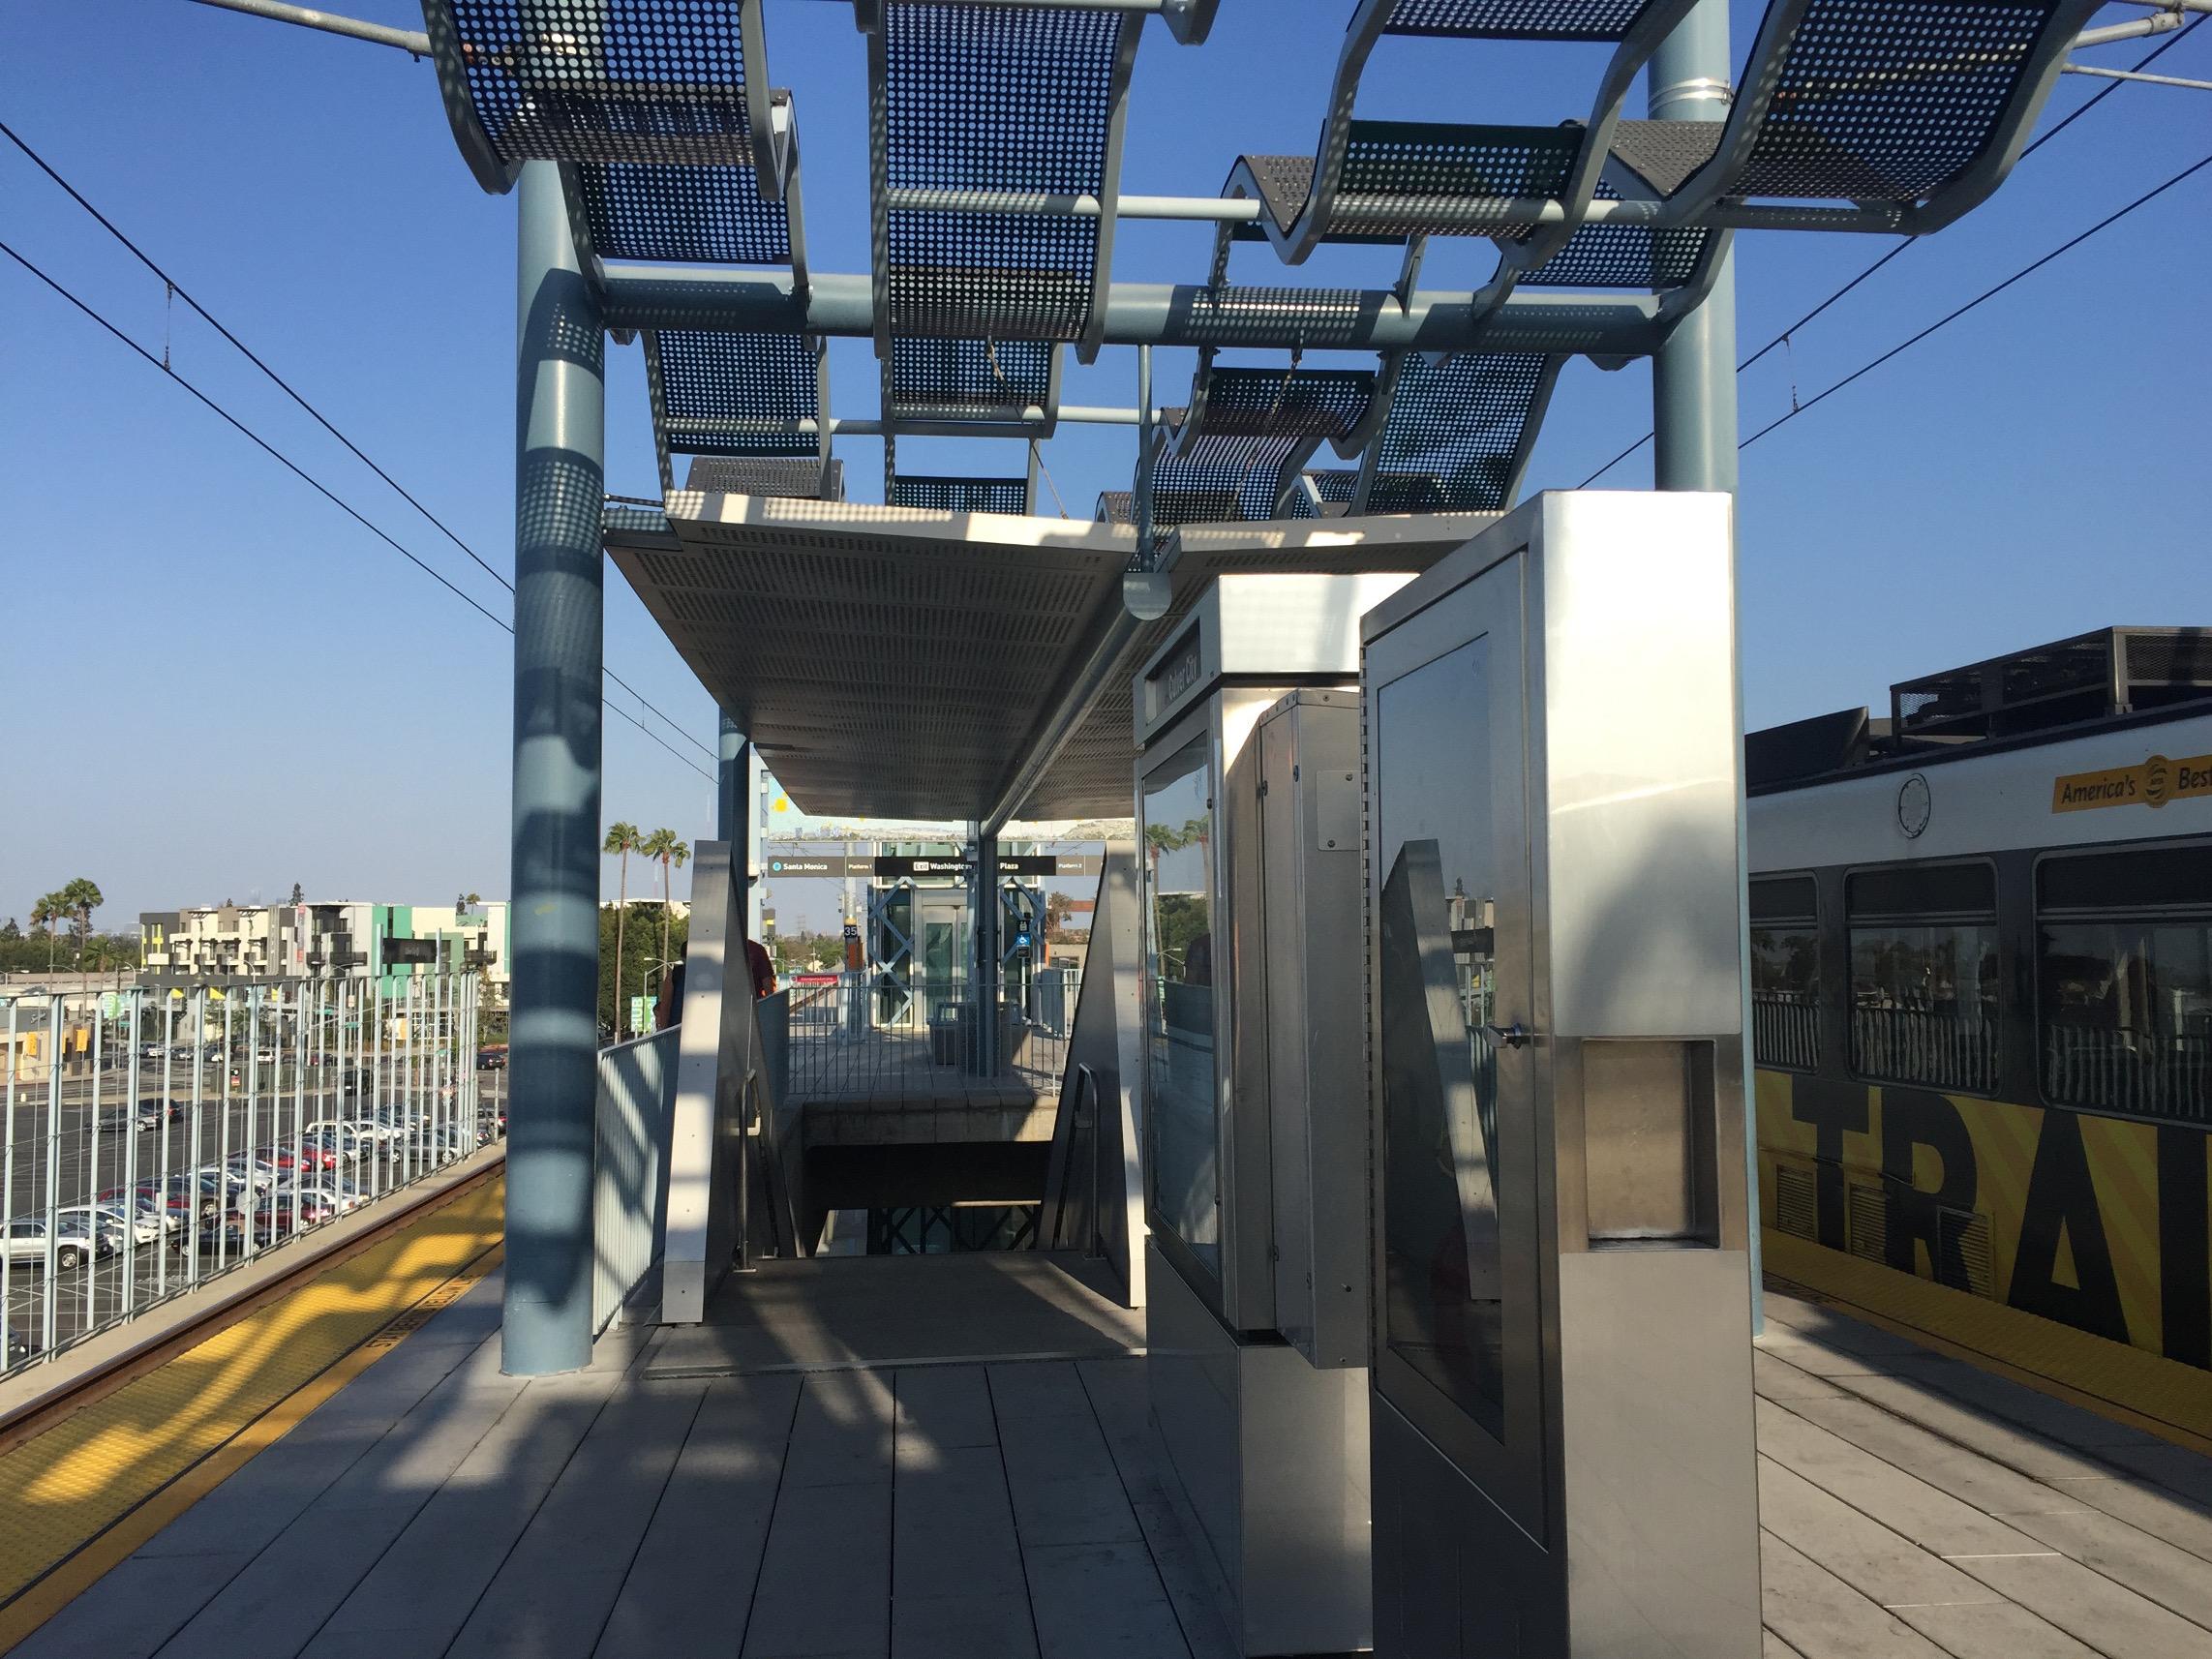 LA Metro, Los Angeles transportation, public transportation